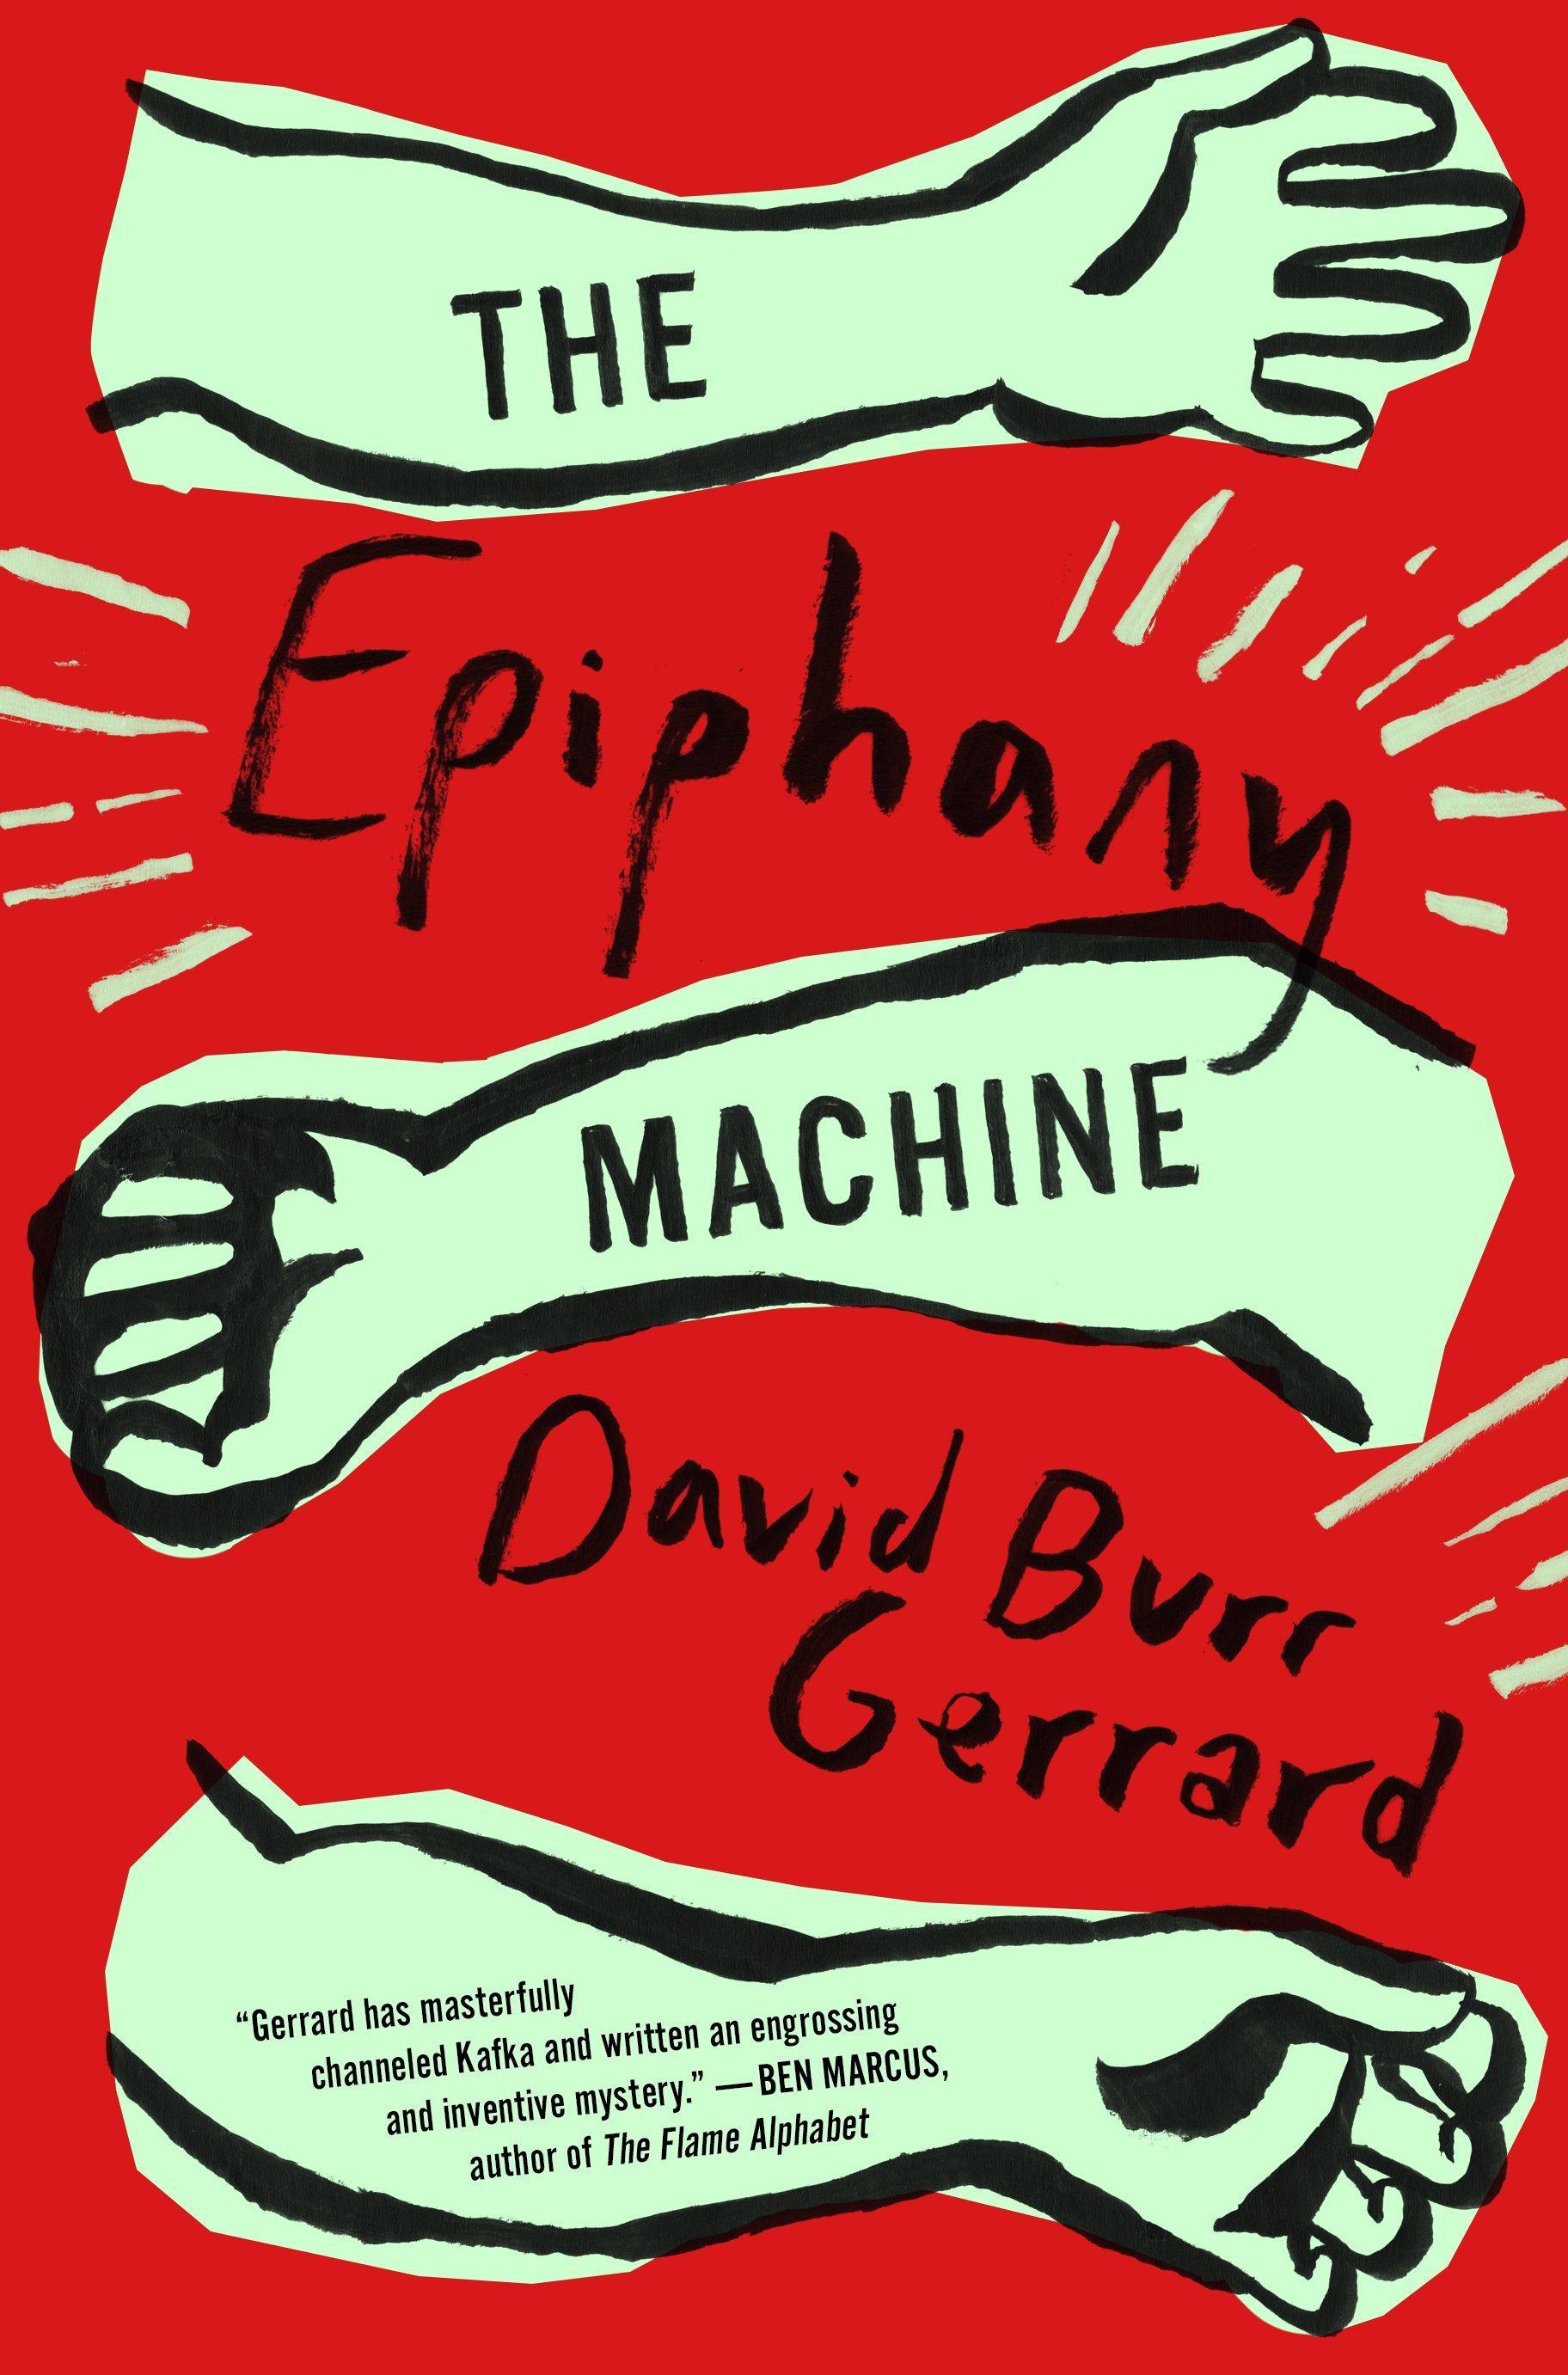 The Epiphany Machine David Burr Gerrard.jpg